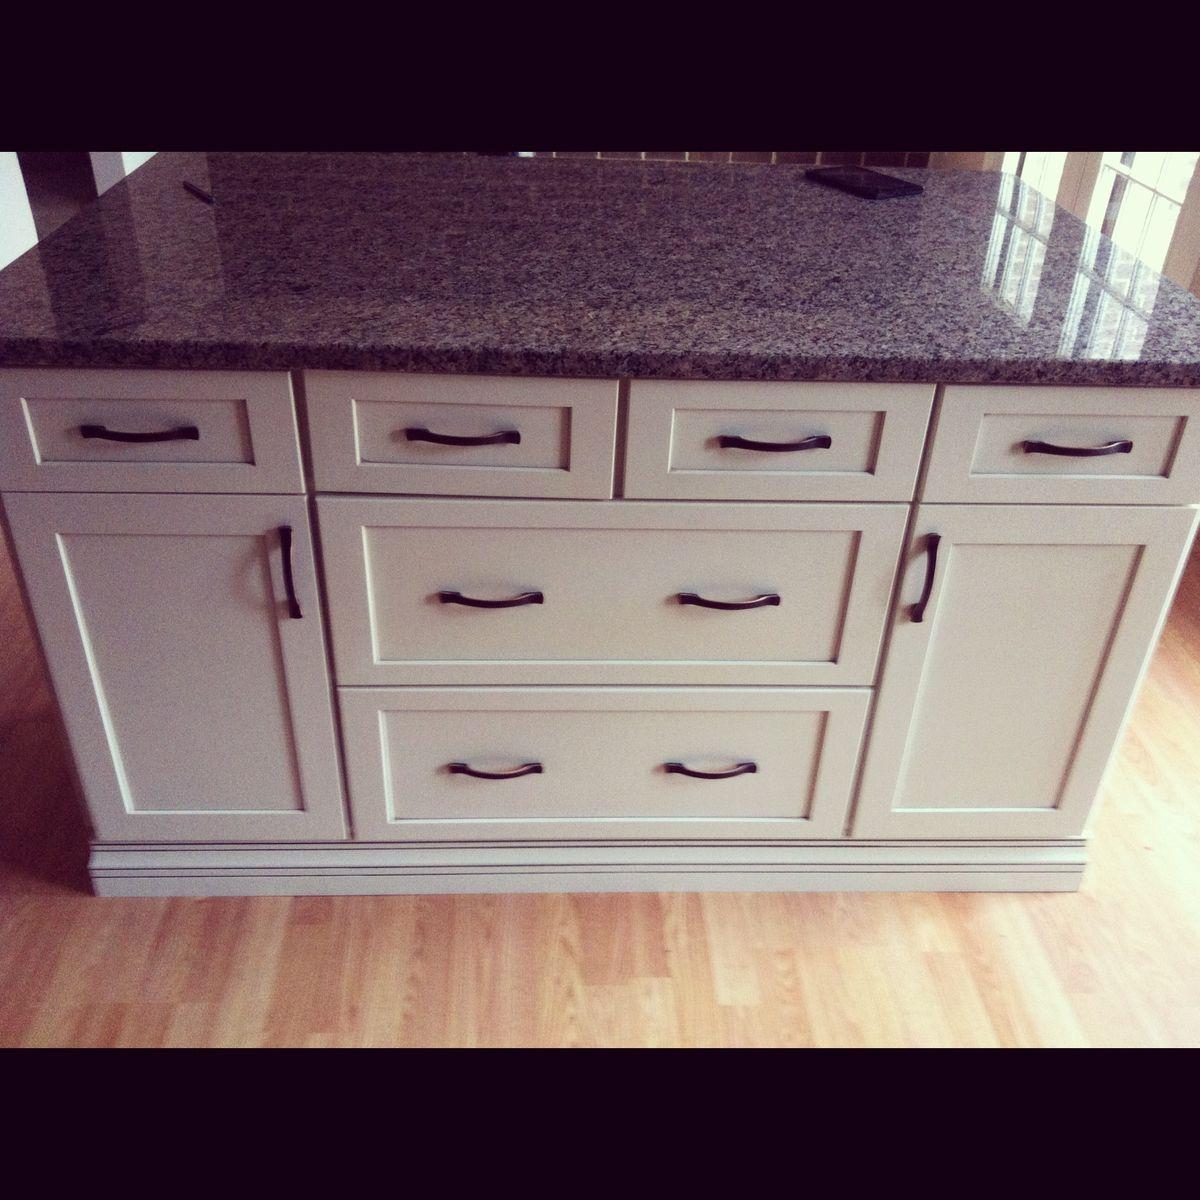 Classic Kitchen Using Uba Tuba Granite With White Cabinets: Neat Kitchen Design With Classic